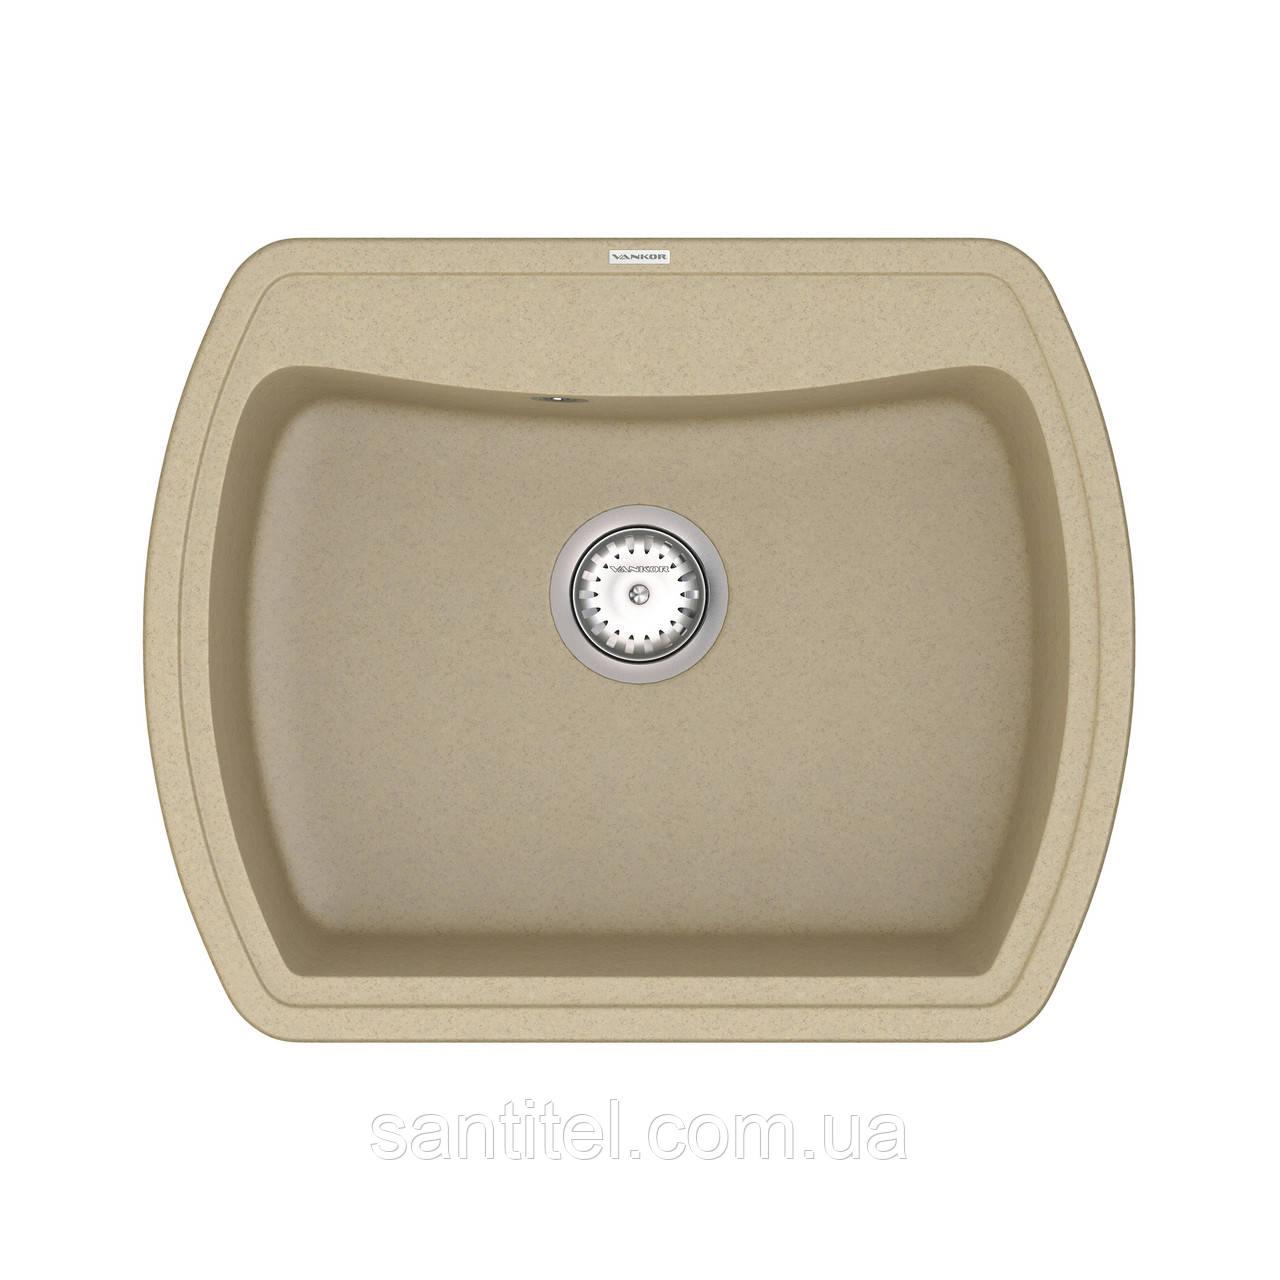 Кухонна мийка VANKOR Norton NMP 01.63 Safari + сифон VANKOR